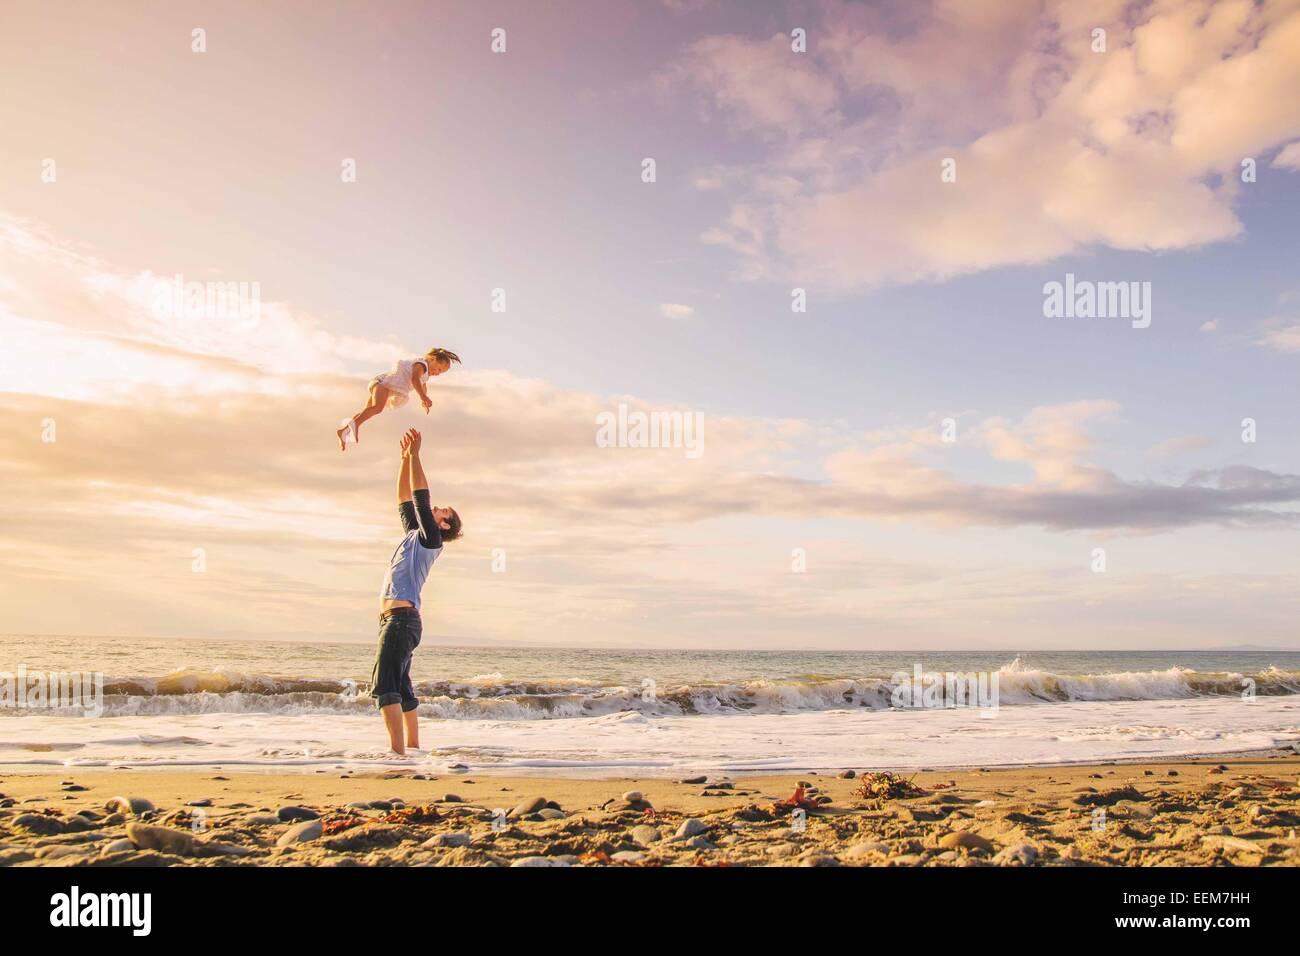 Vater warf junges Mädchen (2-3) in Luft am Strand Stockbild